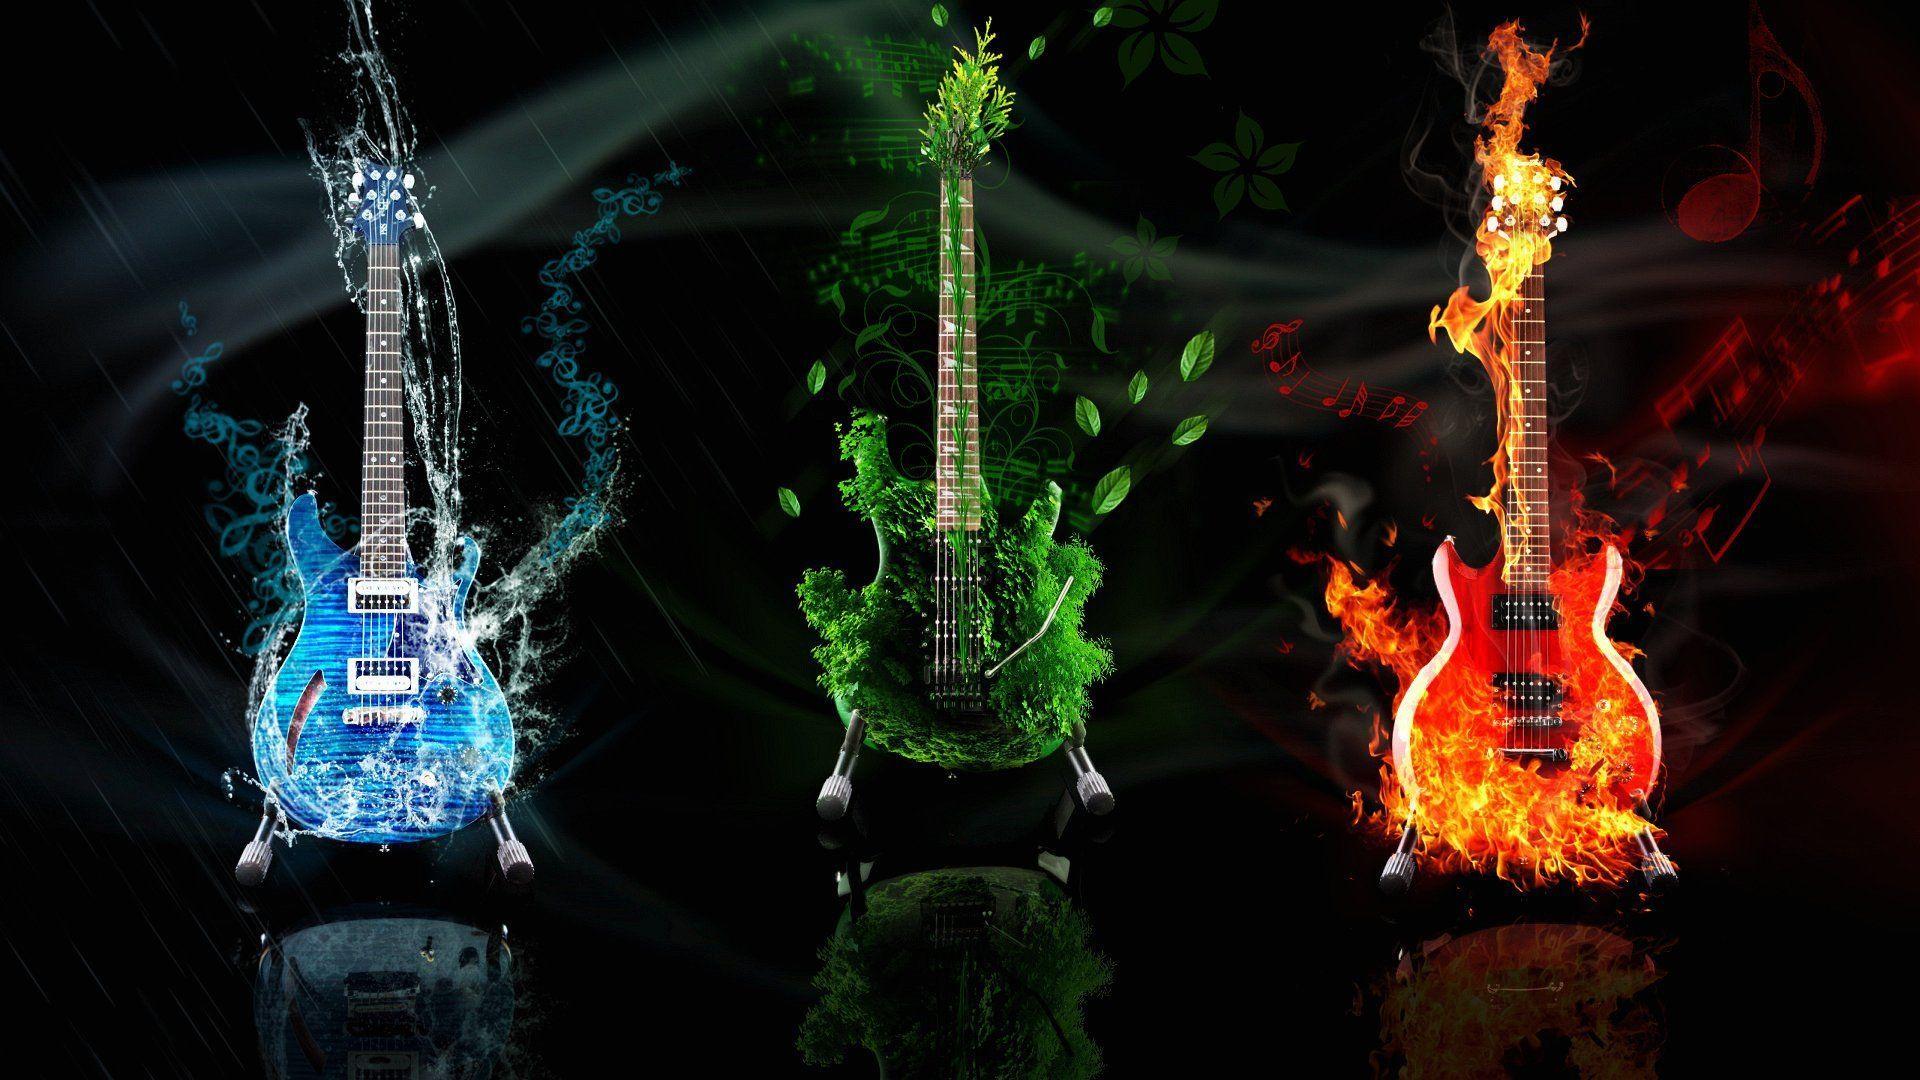 Guitar Abstract, Free Desktop Wallpaper